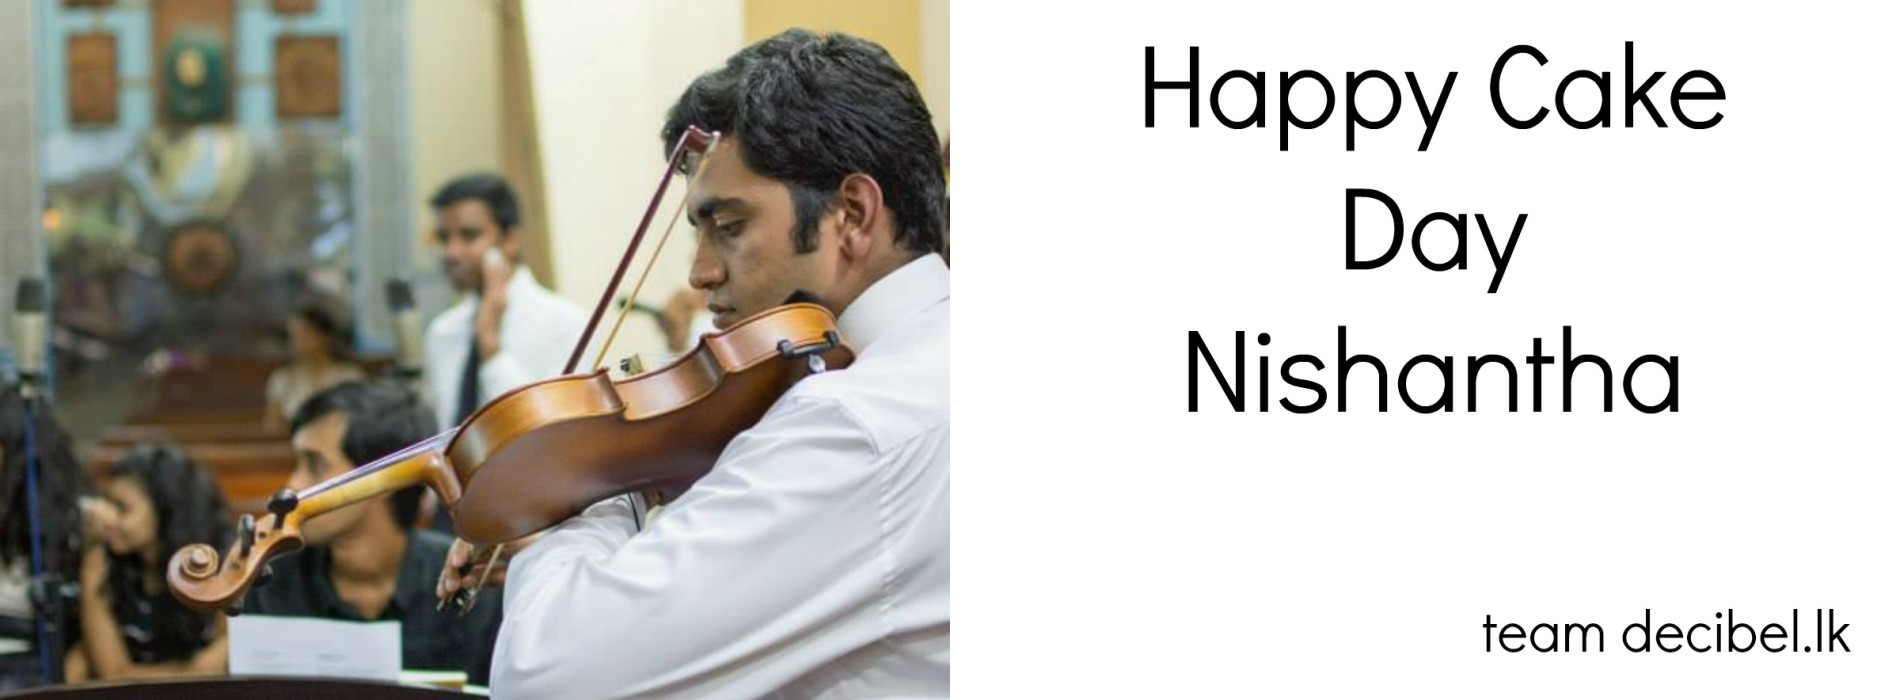 Happy Cake Day Nishantha